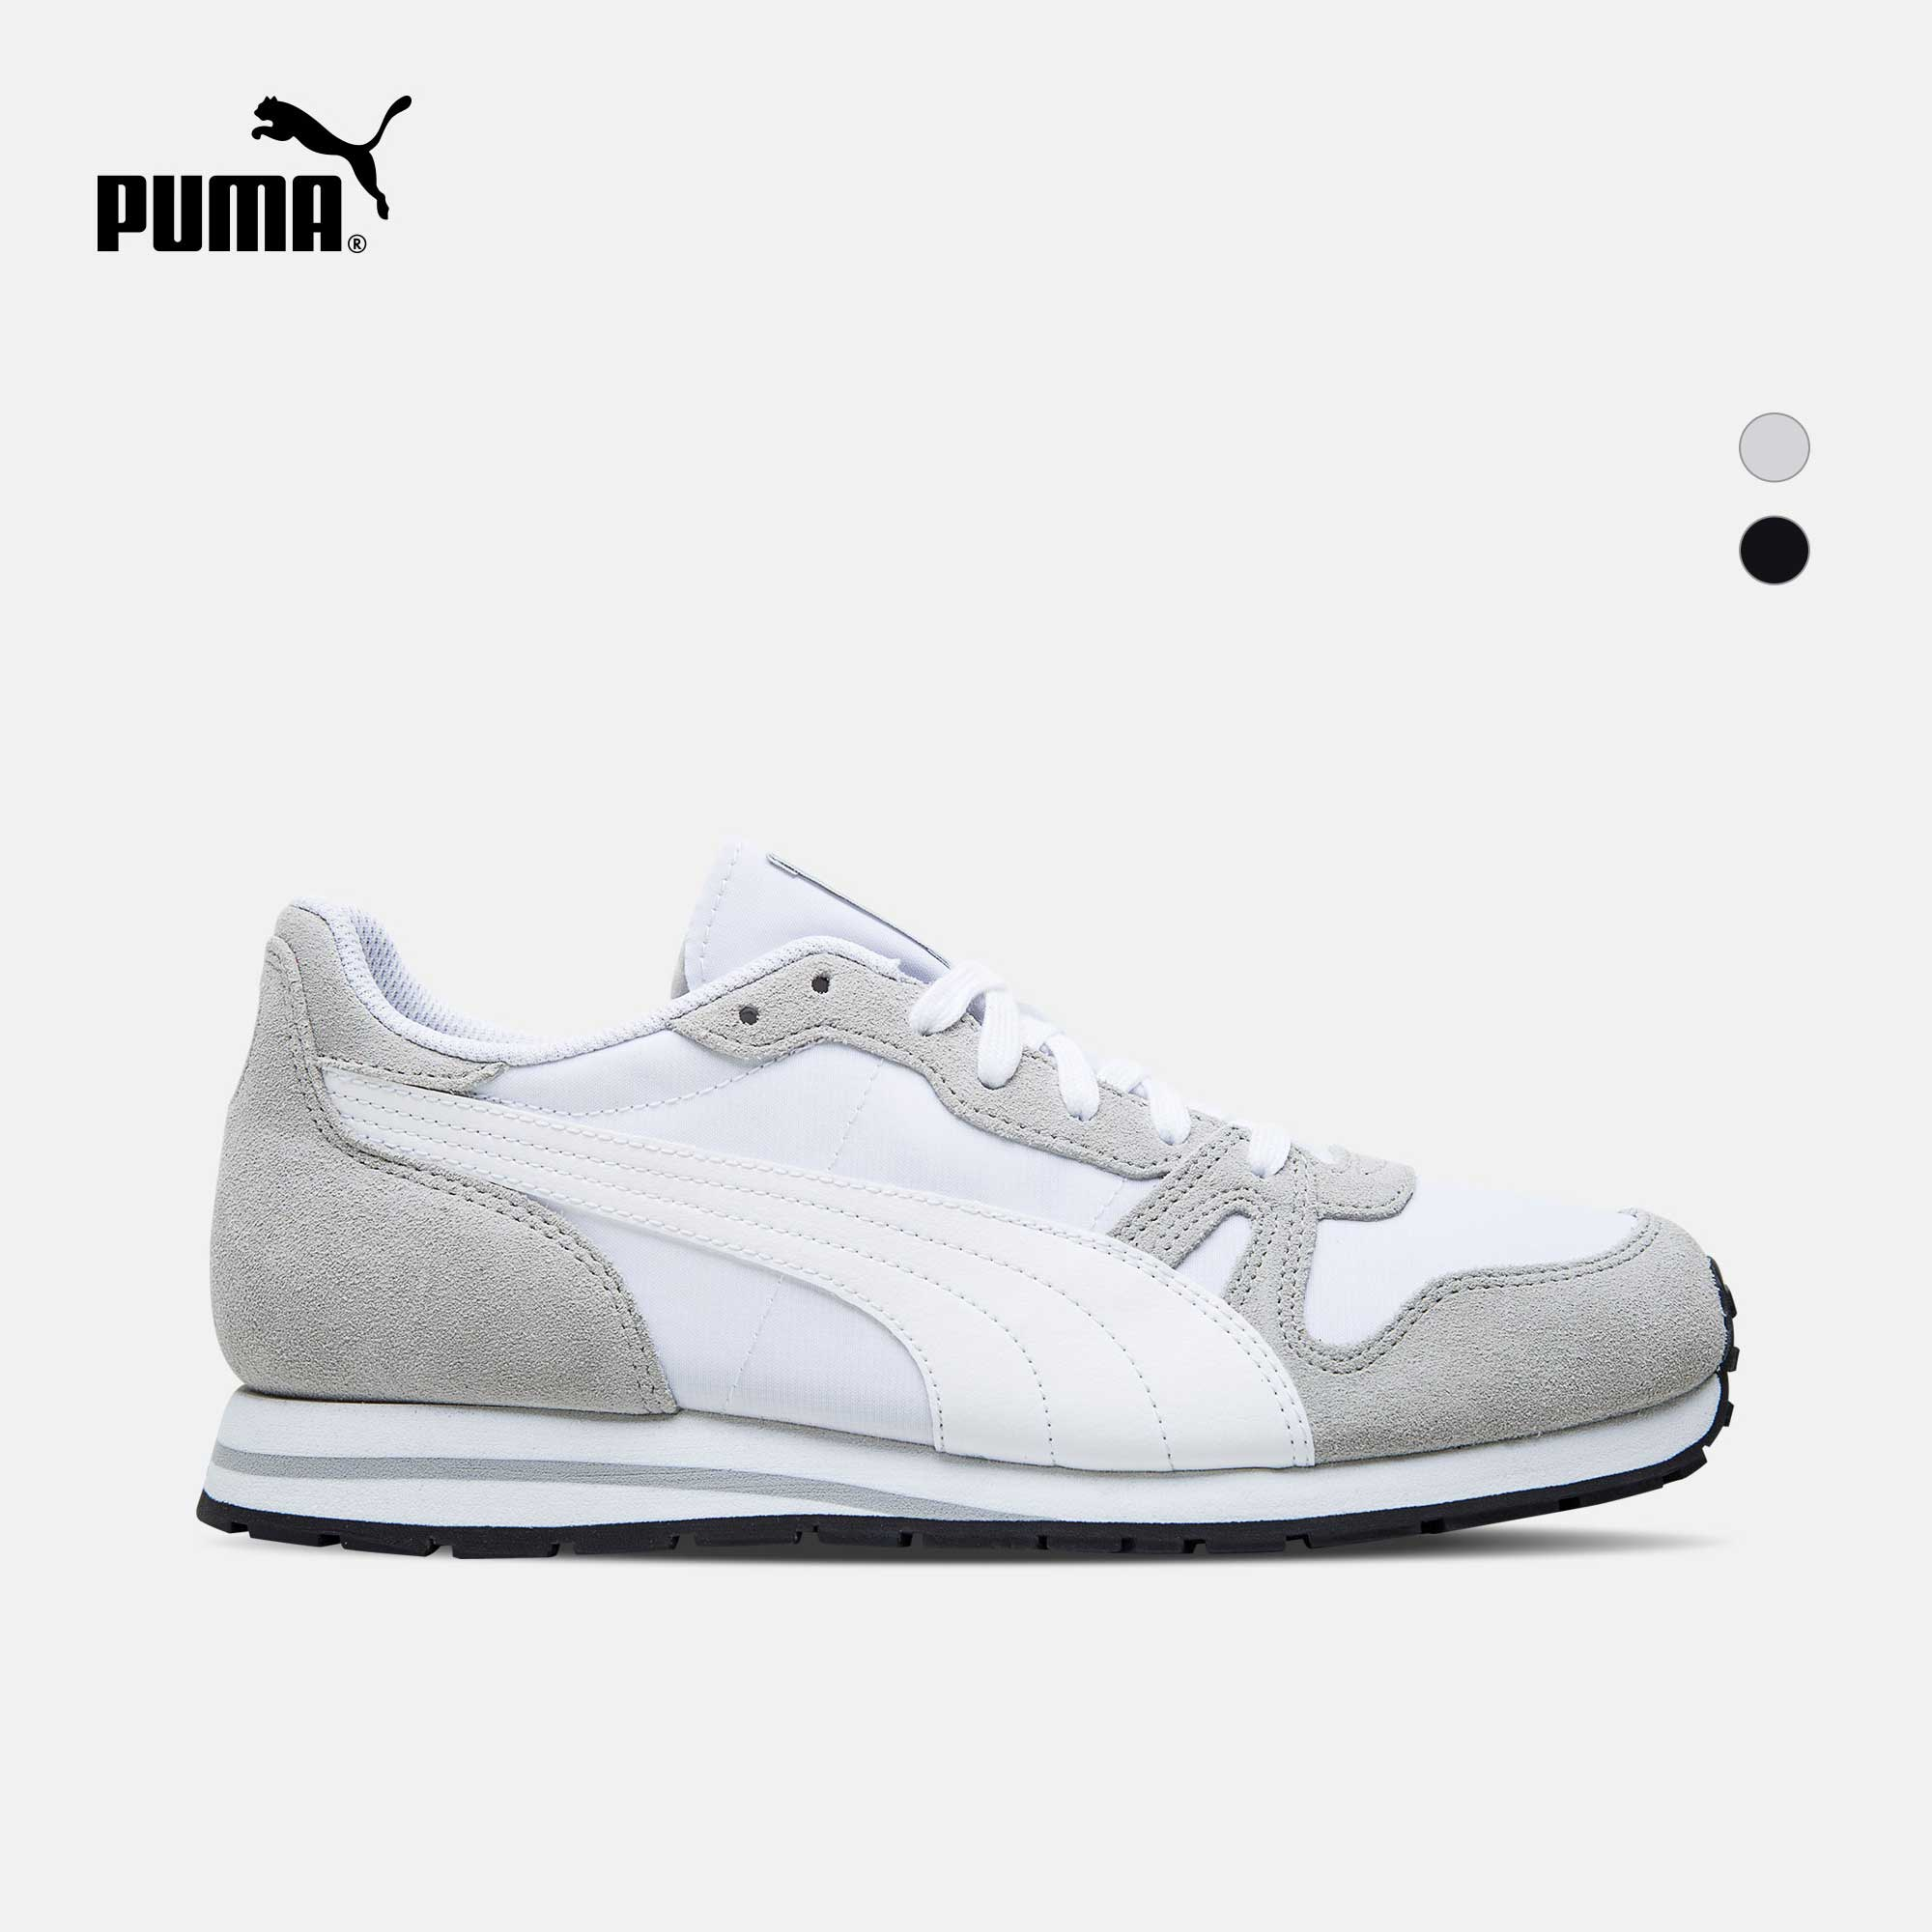 PUMA彪马官方 男女同款运动休闲鞋 Yarra Classic 361403